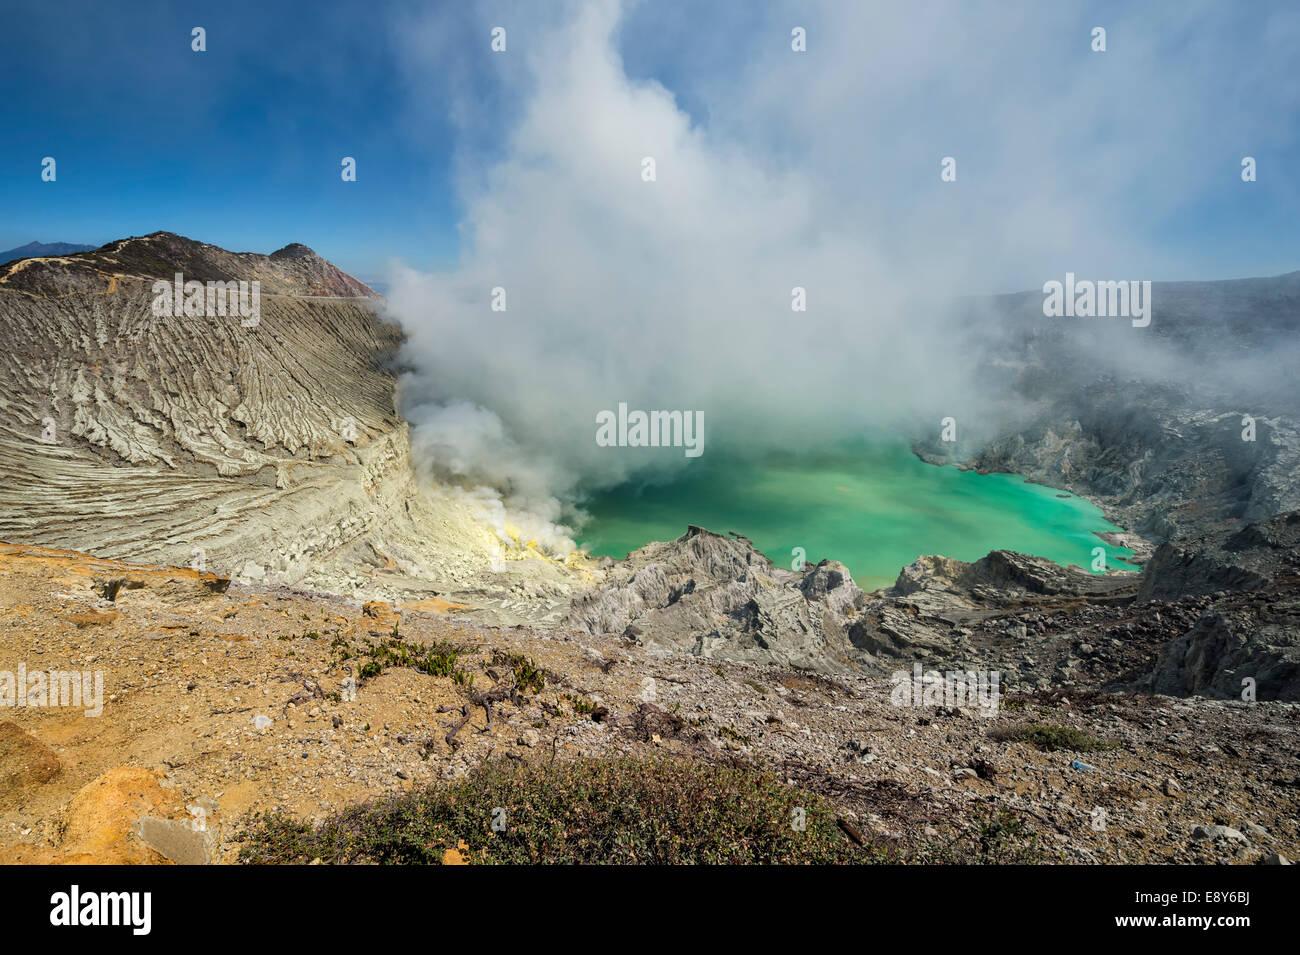 Kawah Ijen volcano (Ijen crater and lake), Banyuwangi, East Java, Indonesia, Asia - Stock Image